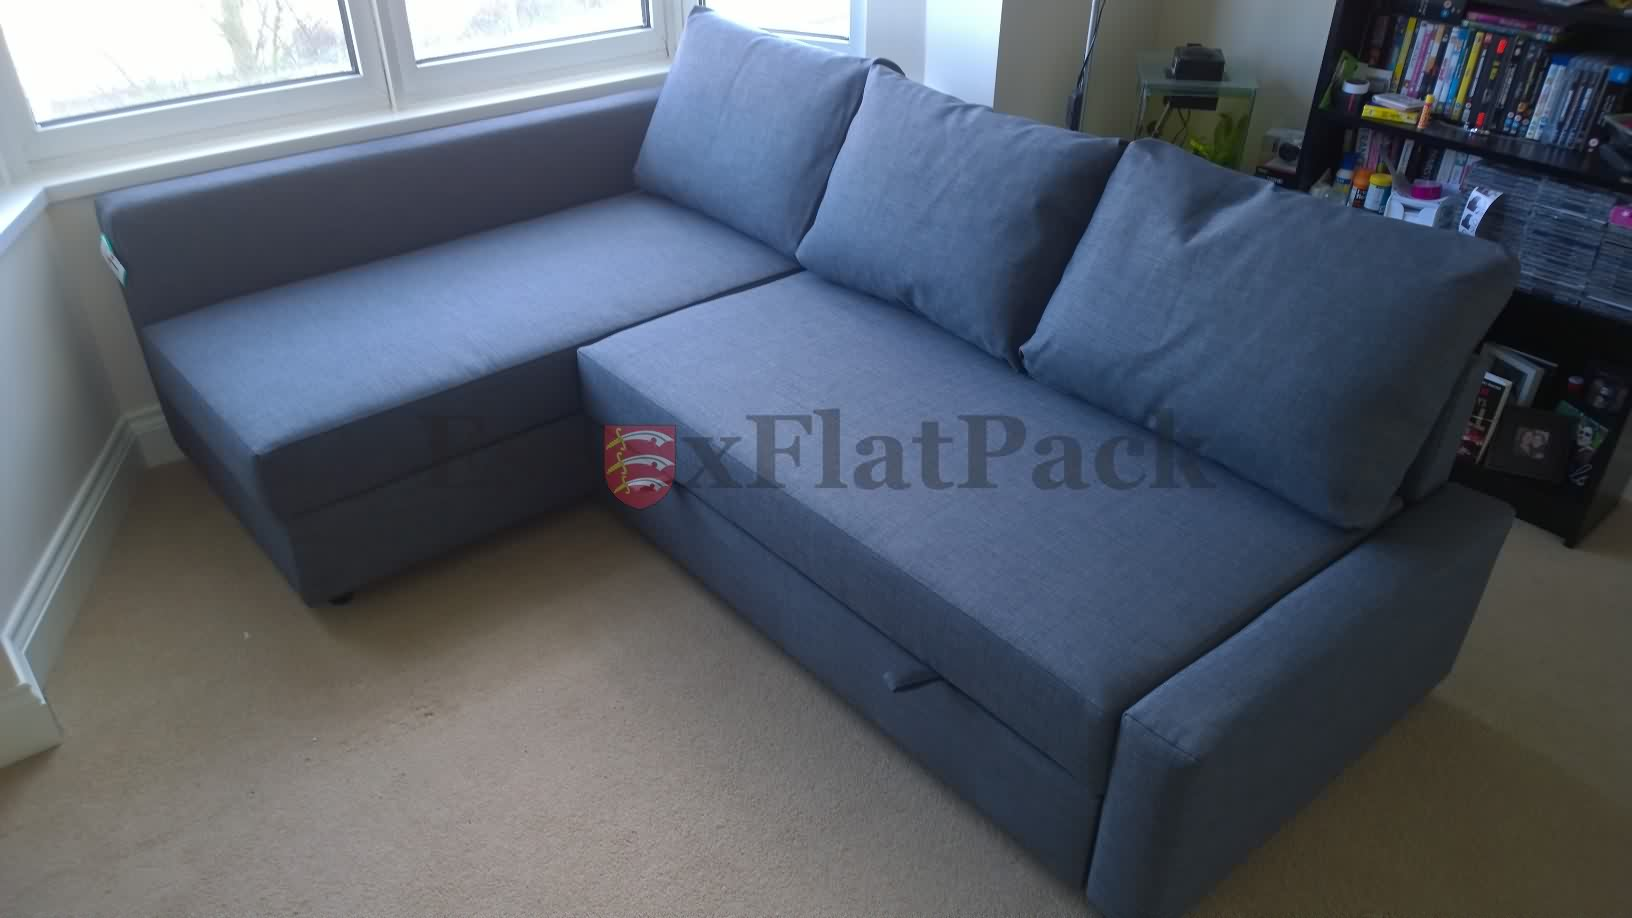 essexflatpack-furniture-20150307112442.jpg